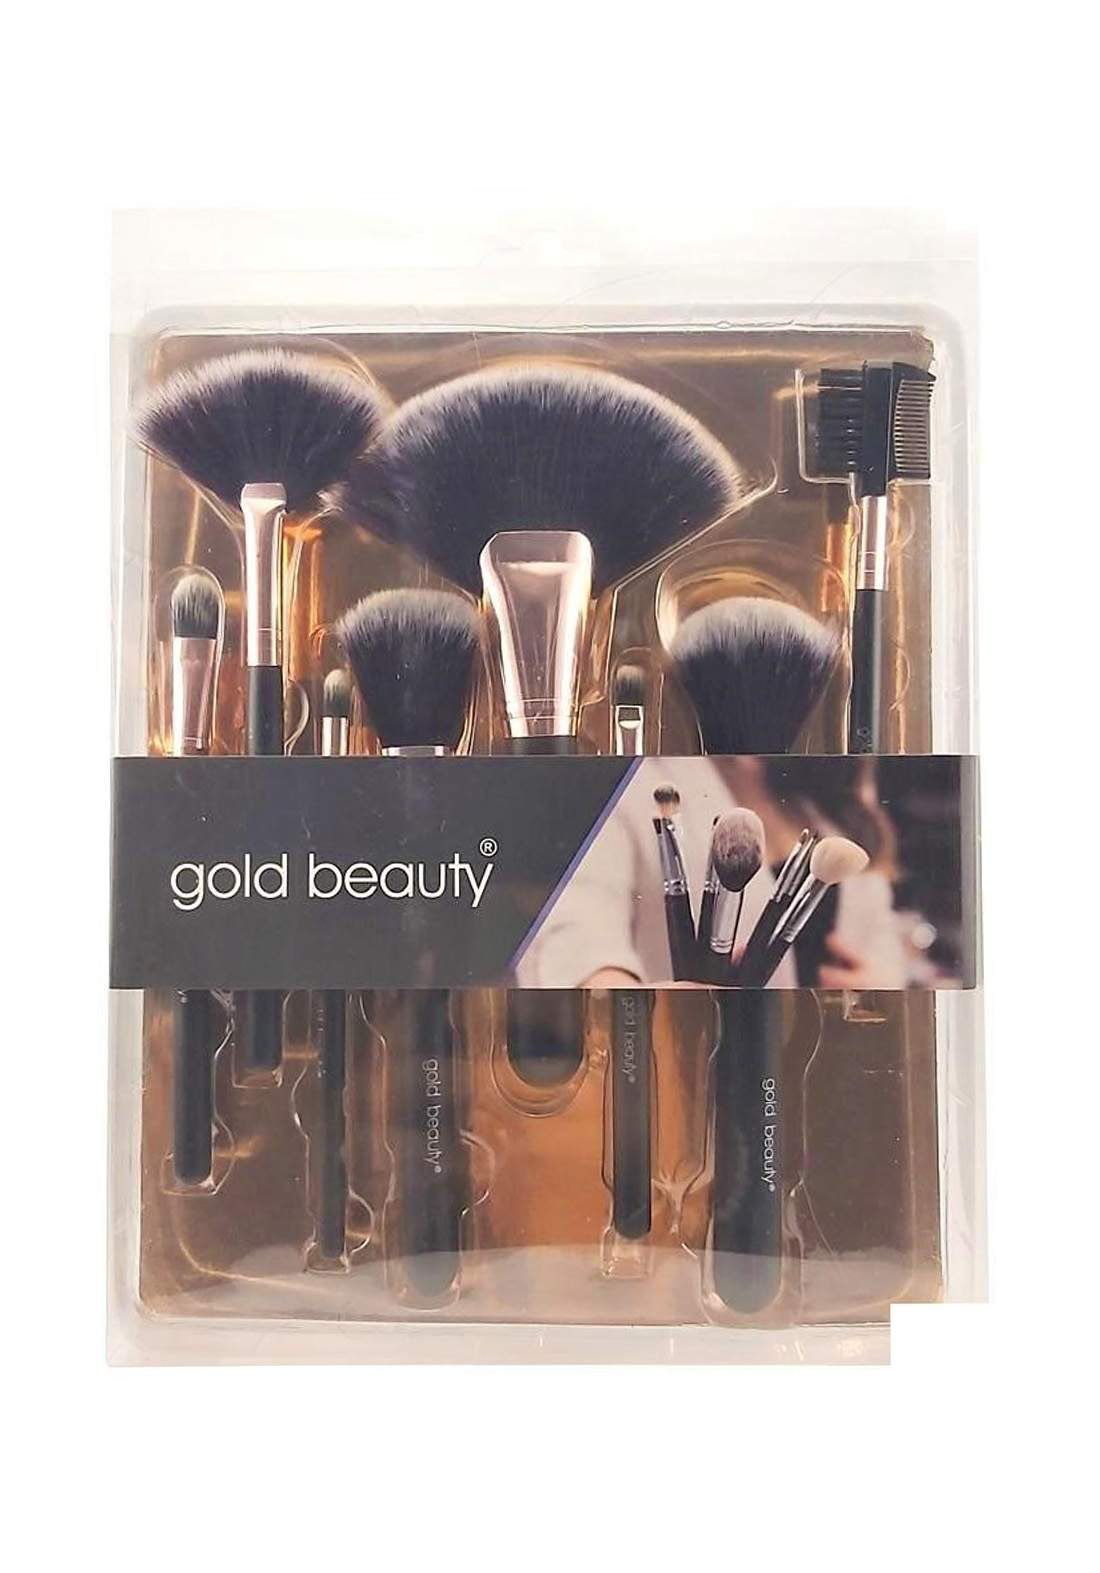 Gold Beauty EP-482 Makeup Brushes 8Pcs سيت فرش مكياج